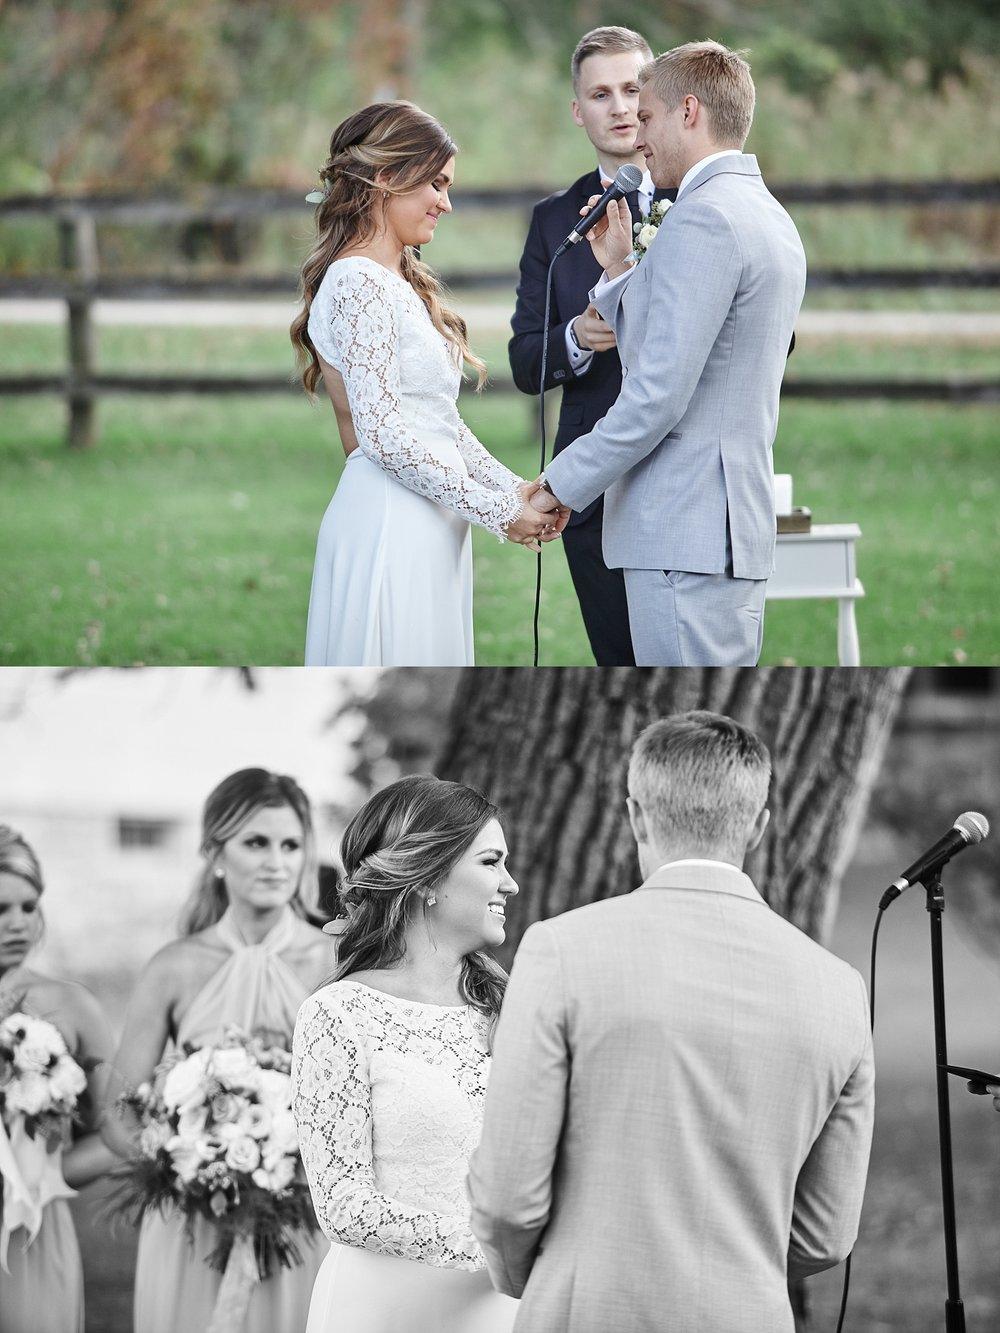 Maywood-Stone-Barn-Wedding-Rochester-Minnesota-Perry-James-Photo_0647.jpg